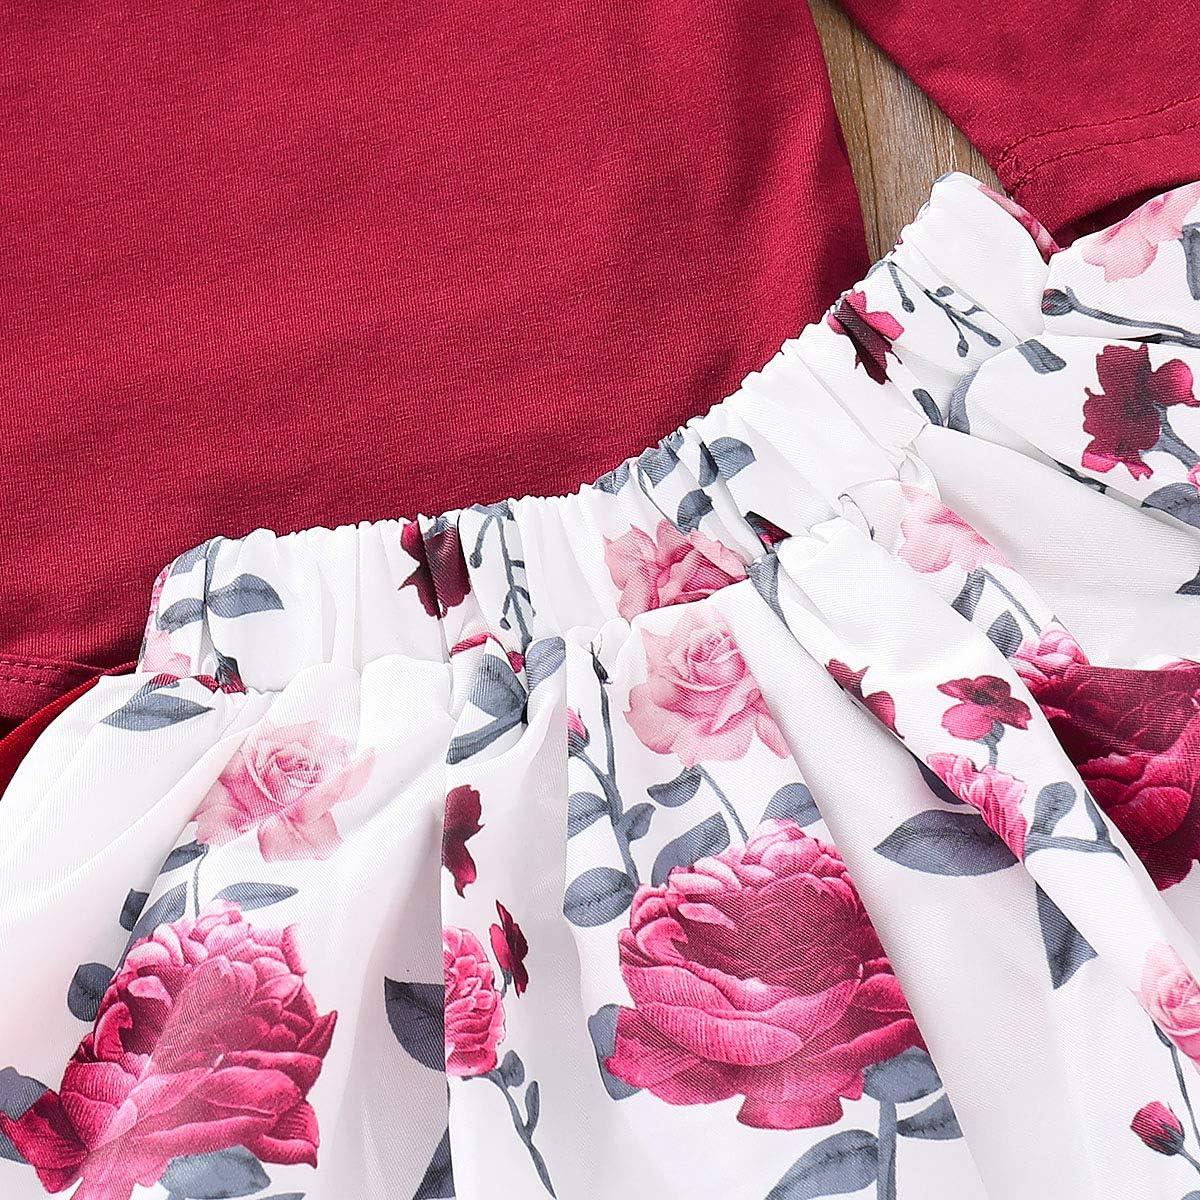 0-2T Girls Long Sleeve Romper Baby Girl 3 PCS Outfits Ruffle Shoulder Romper Rose Print Skirt Bowknot Headband Sets